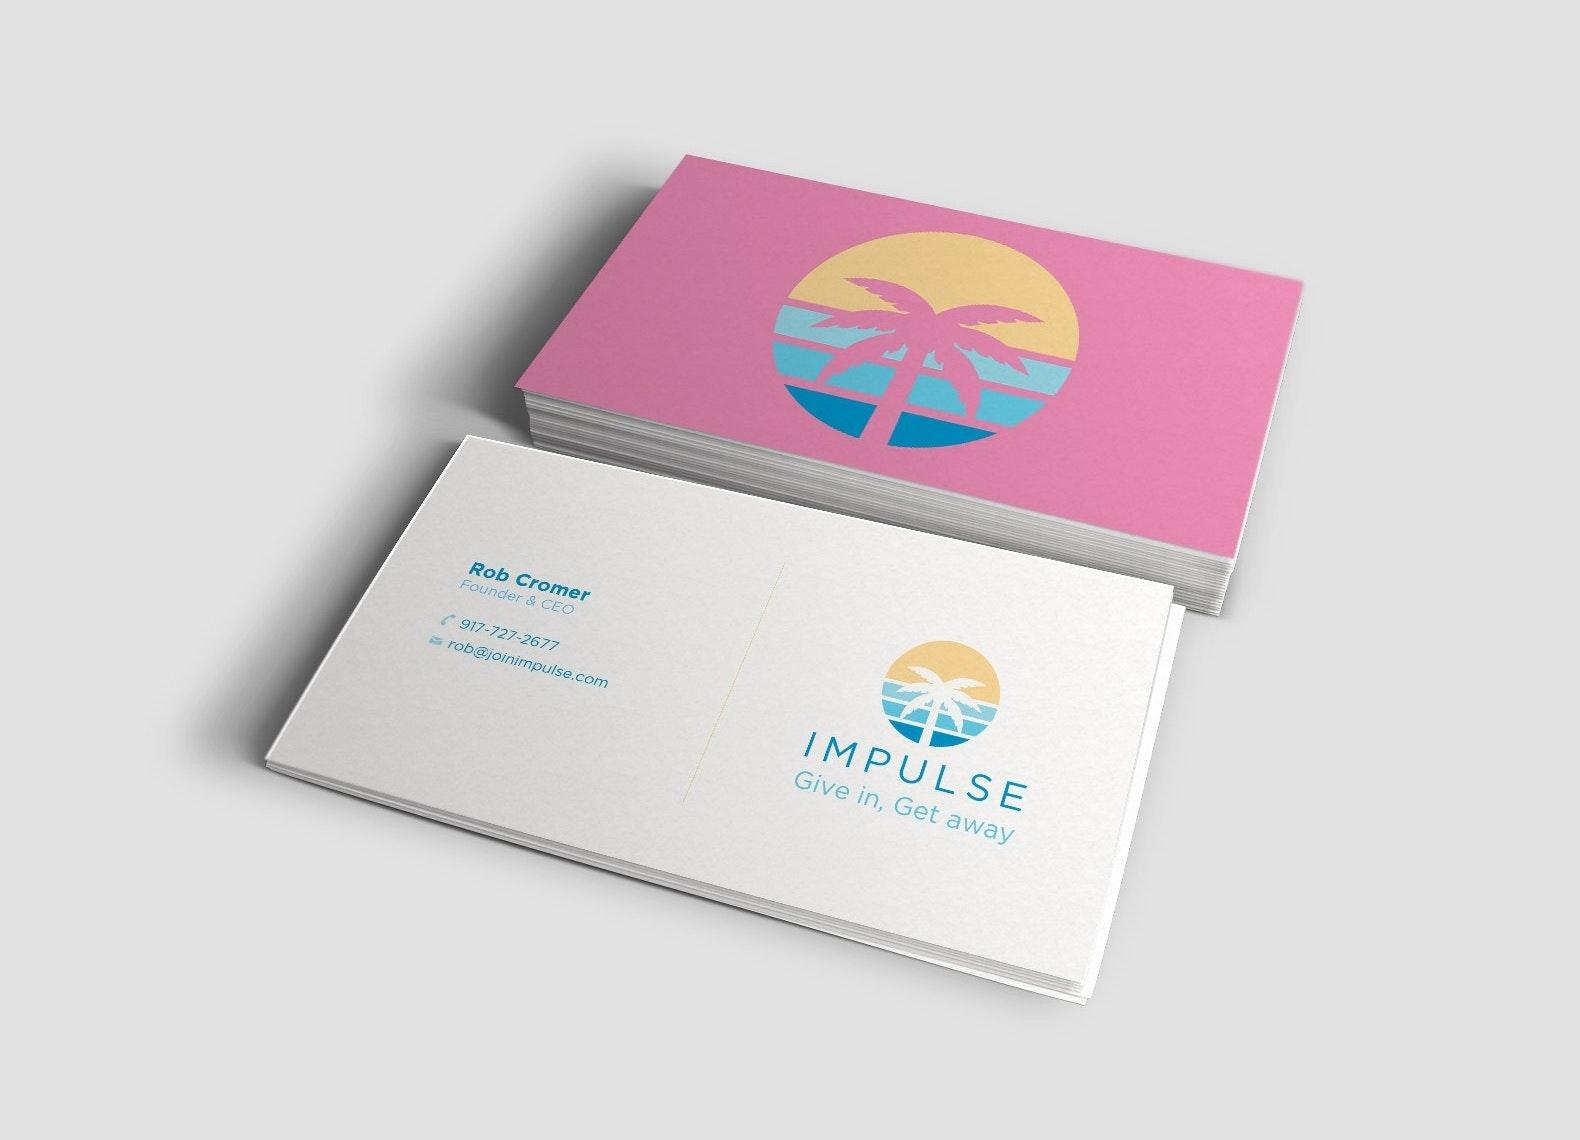 Impulse travel agency